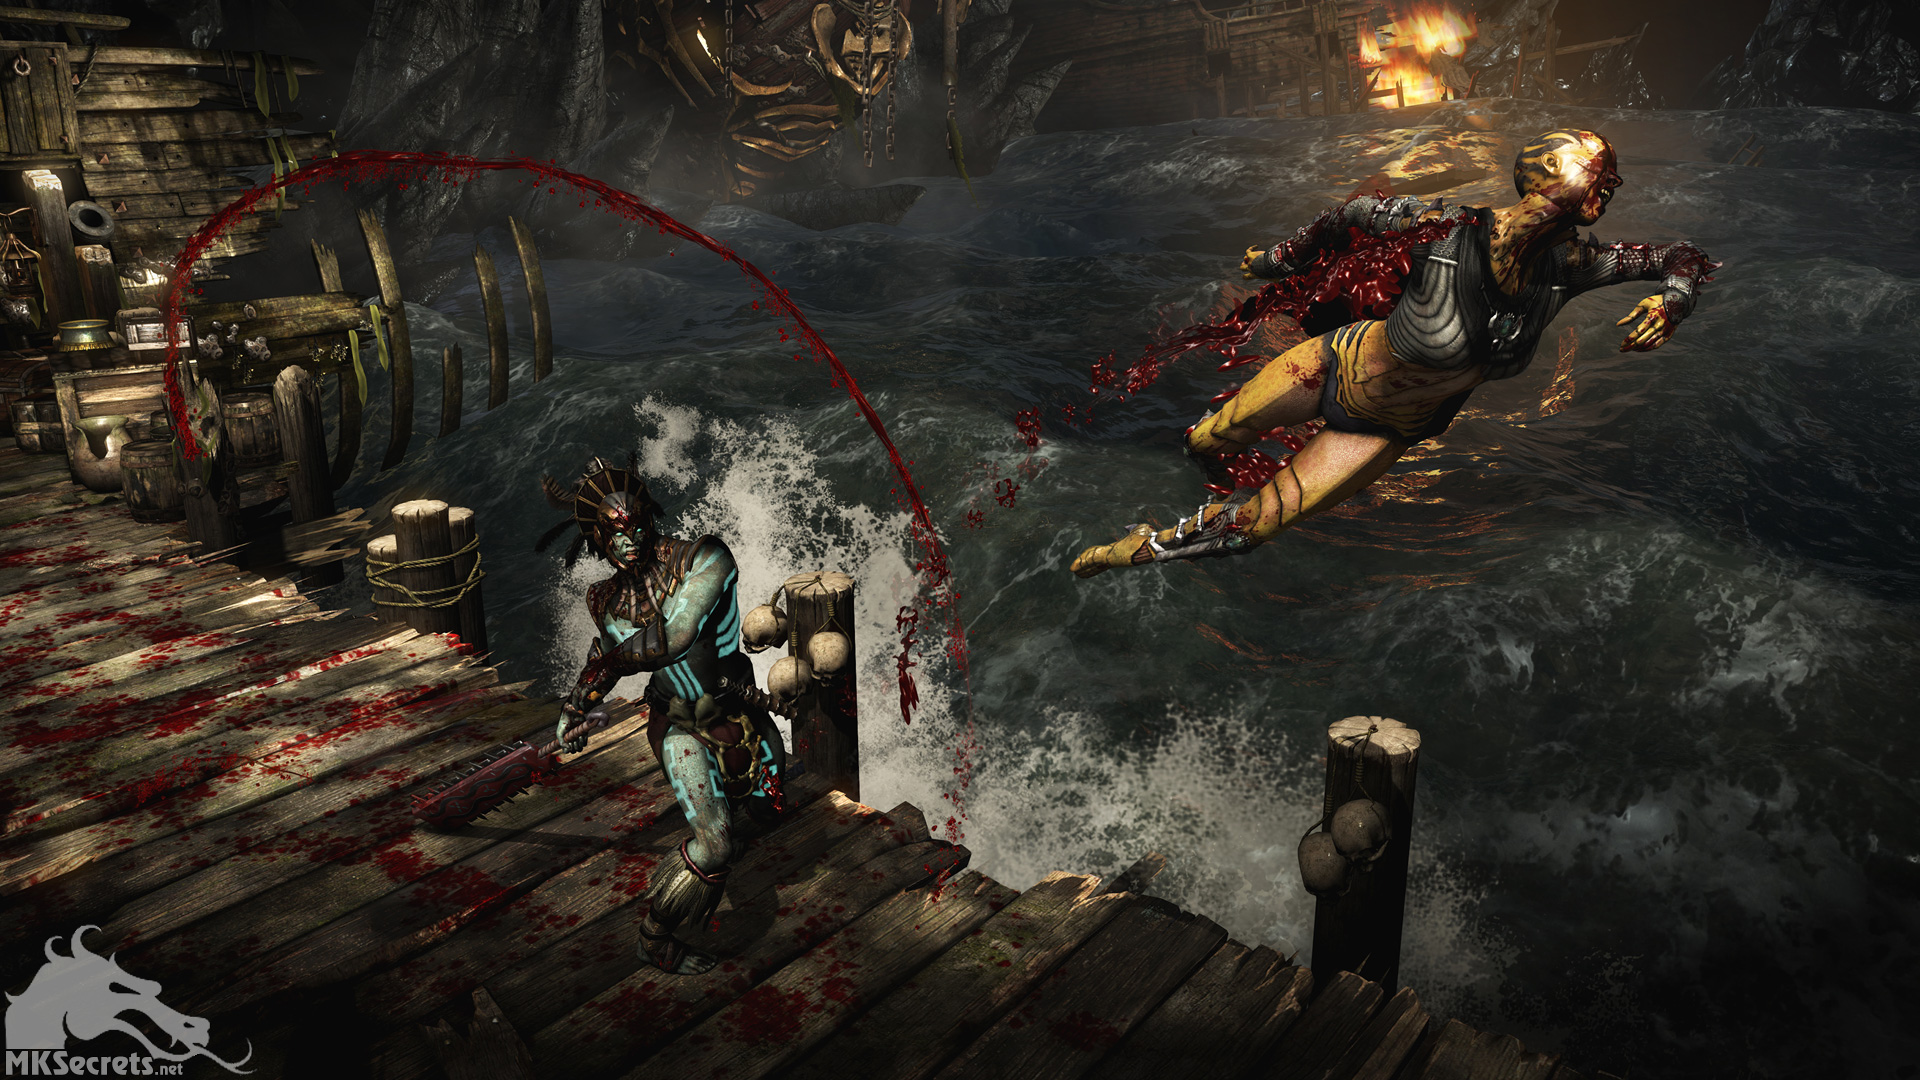 Mortal Kombat X Screenshots for PlayStation 4 - MobyGames